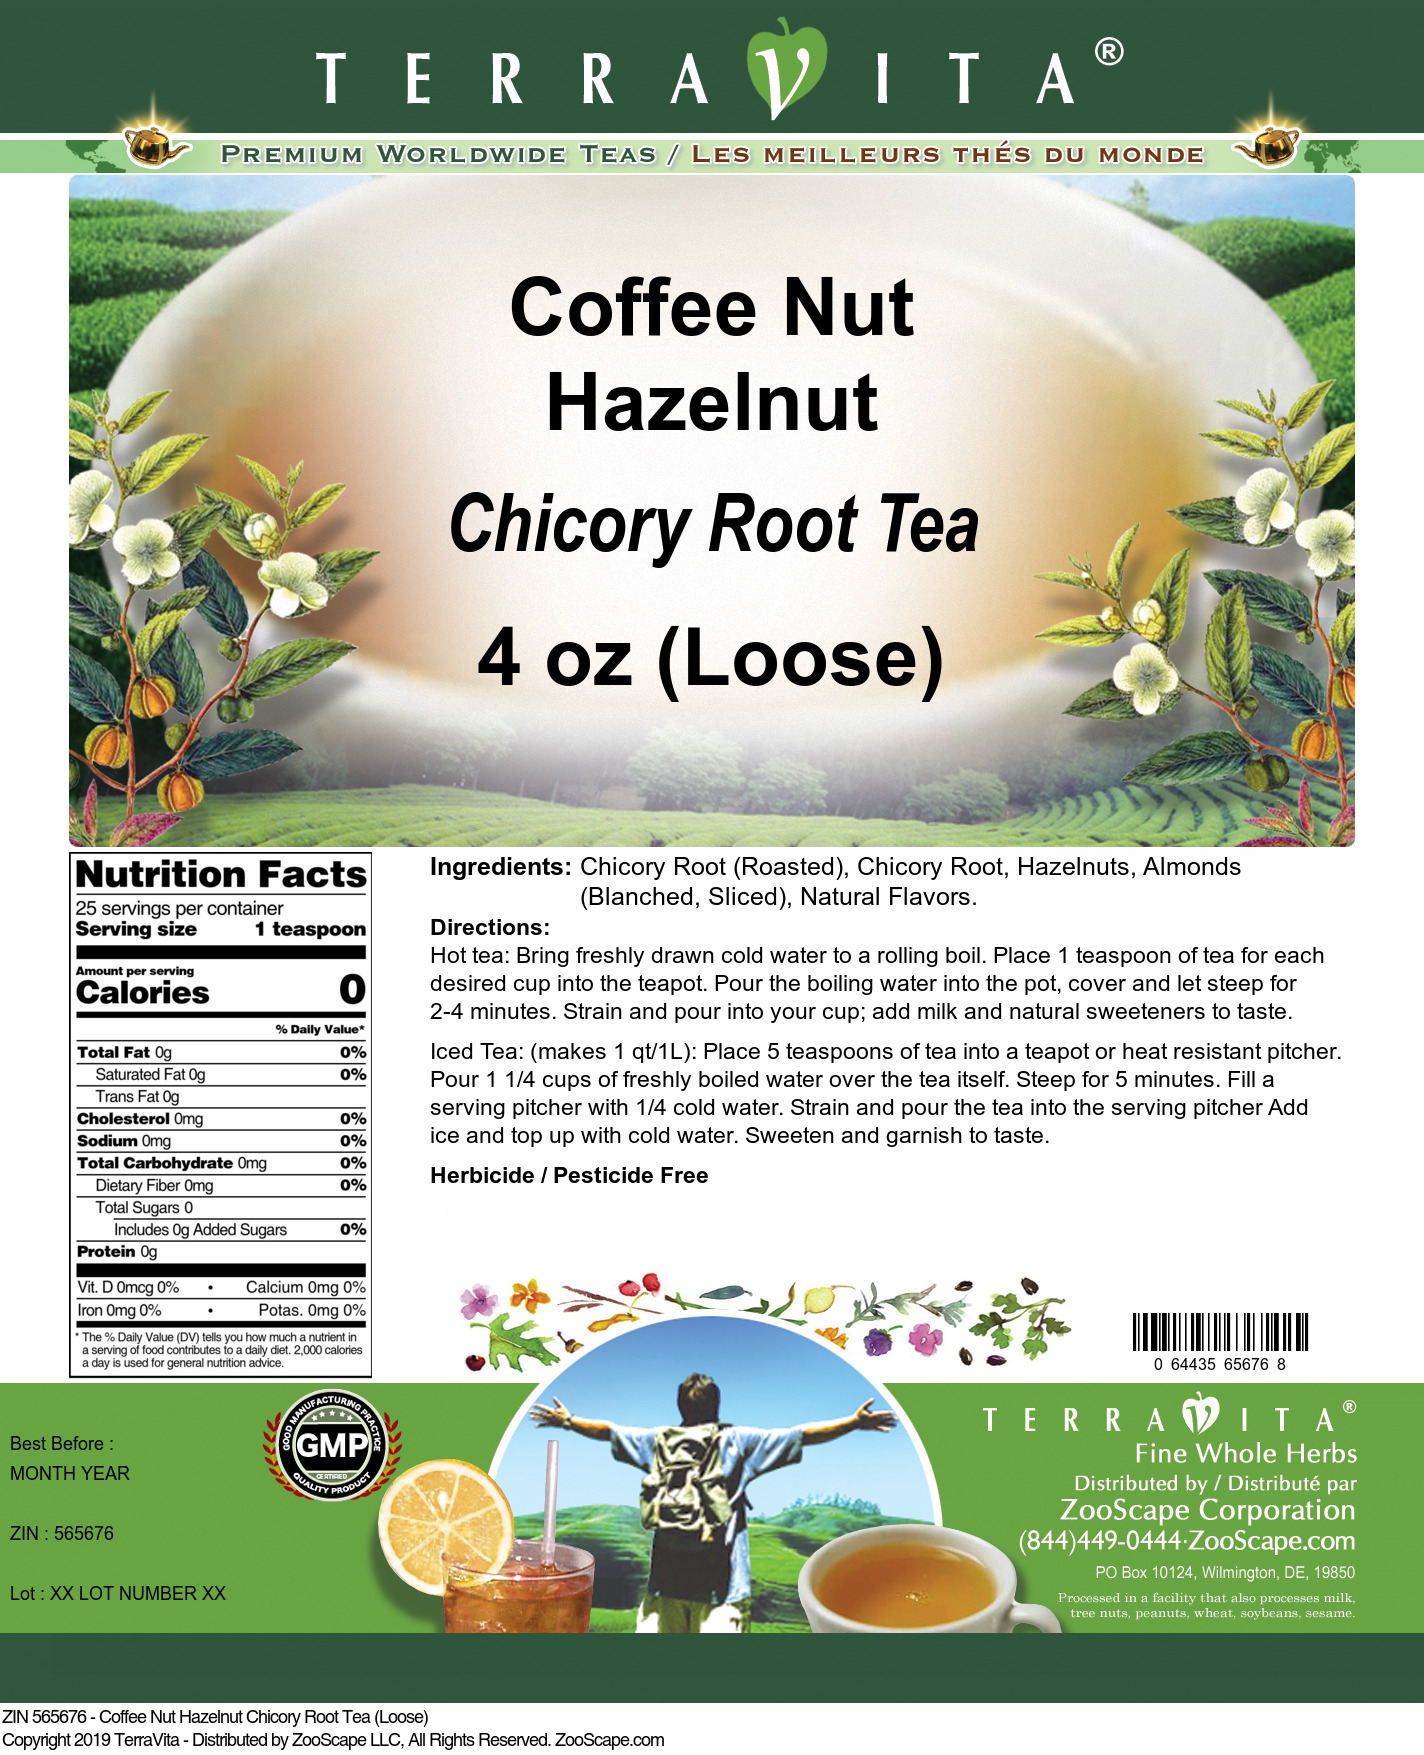 Coffee Nut Hazelnut Chicory Root Tea (Loose)